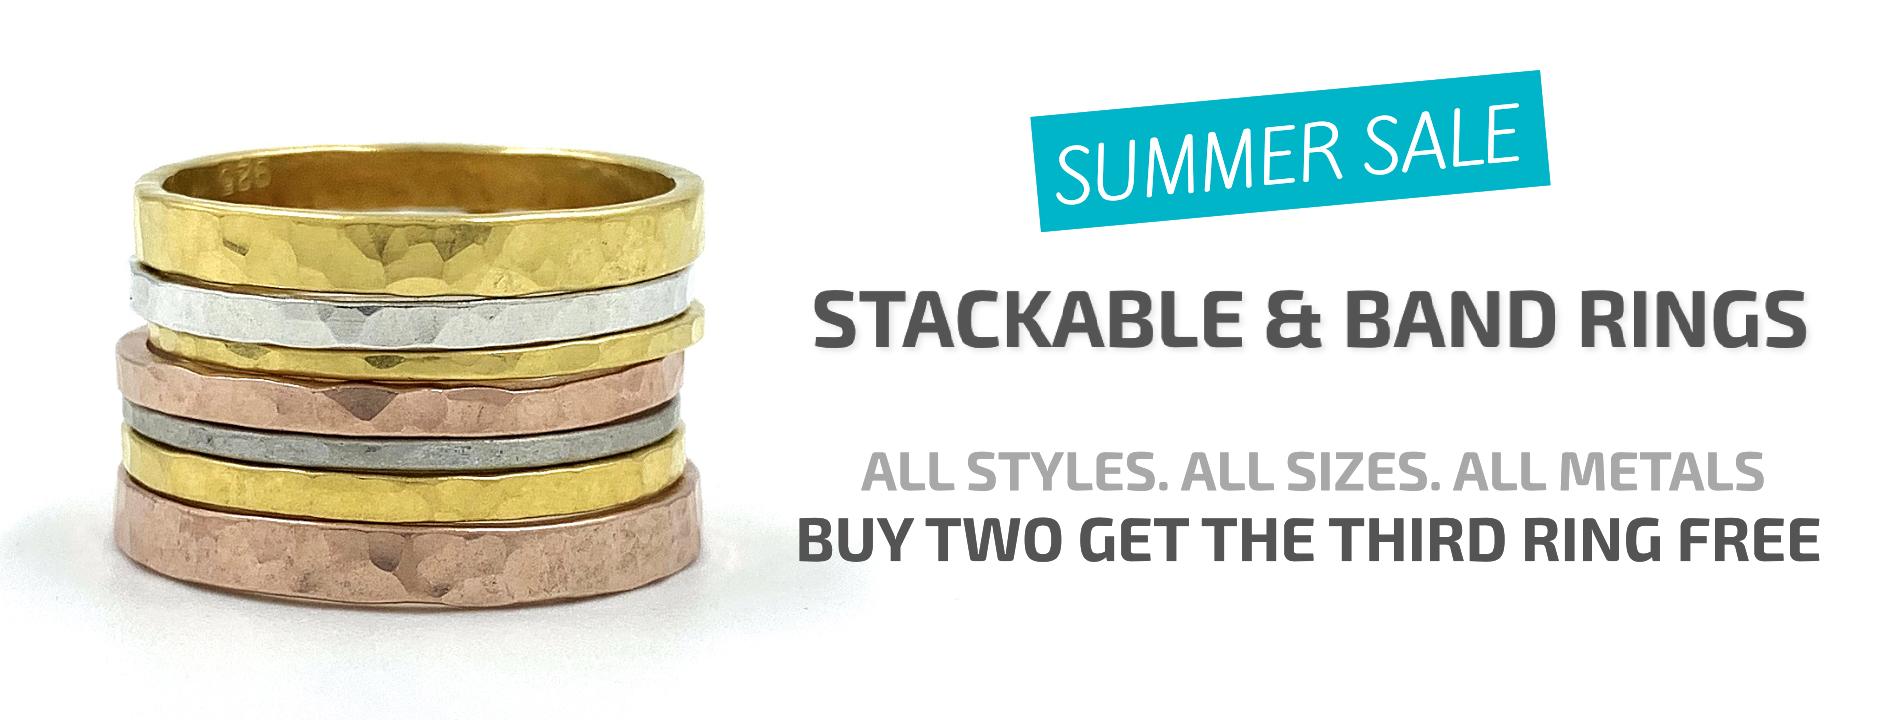 summer-rings-sale-main-carousel.png